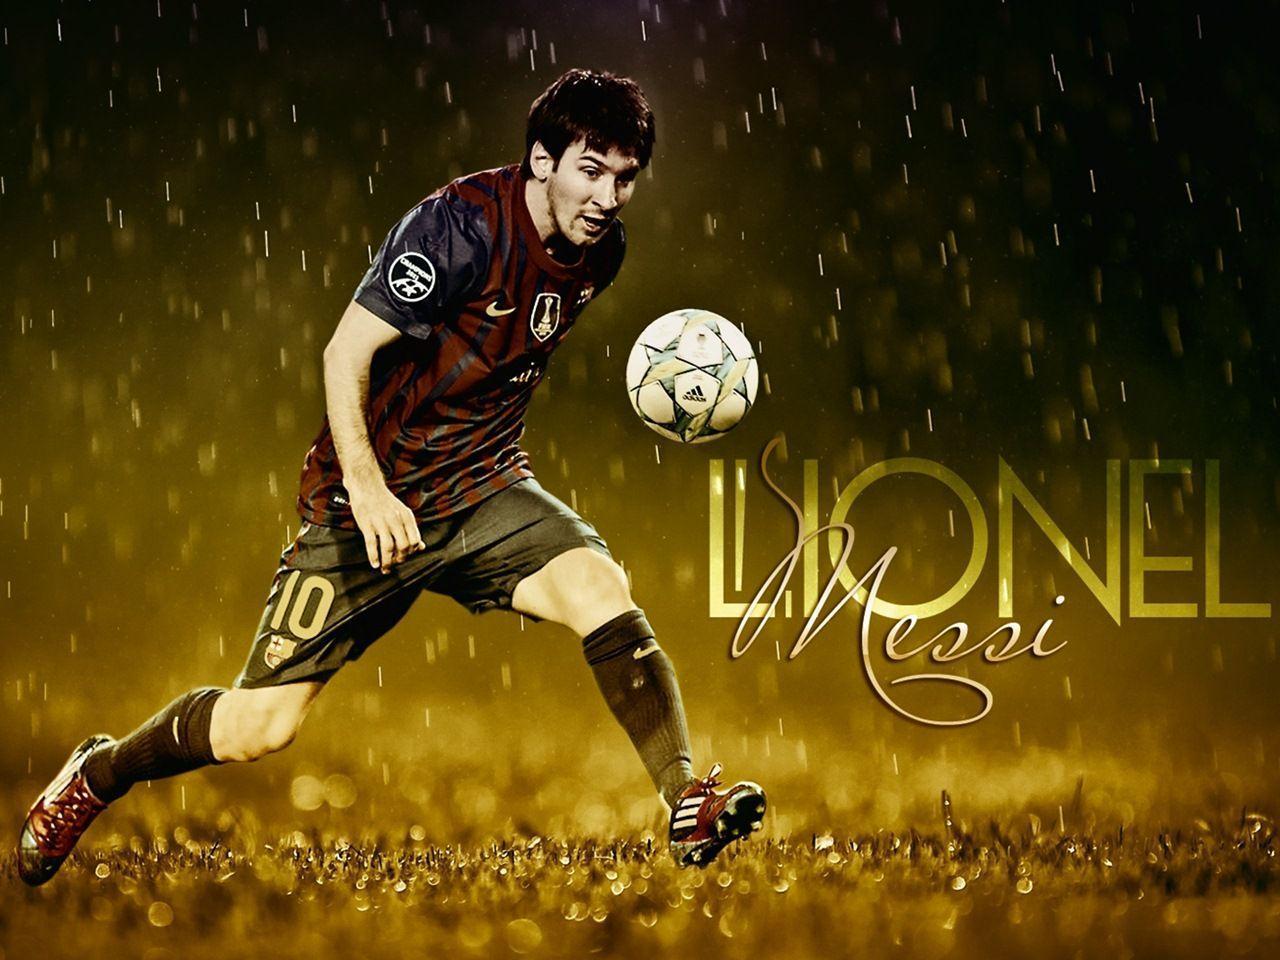 Lionel Messi HD Soccer Wallpaper 4197 Full HD Wallpaper Desktop ...